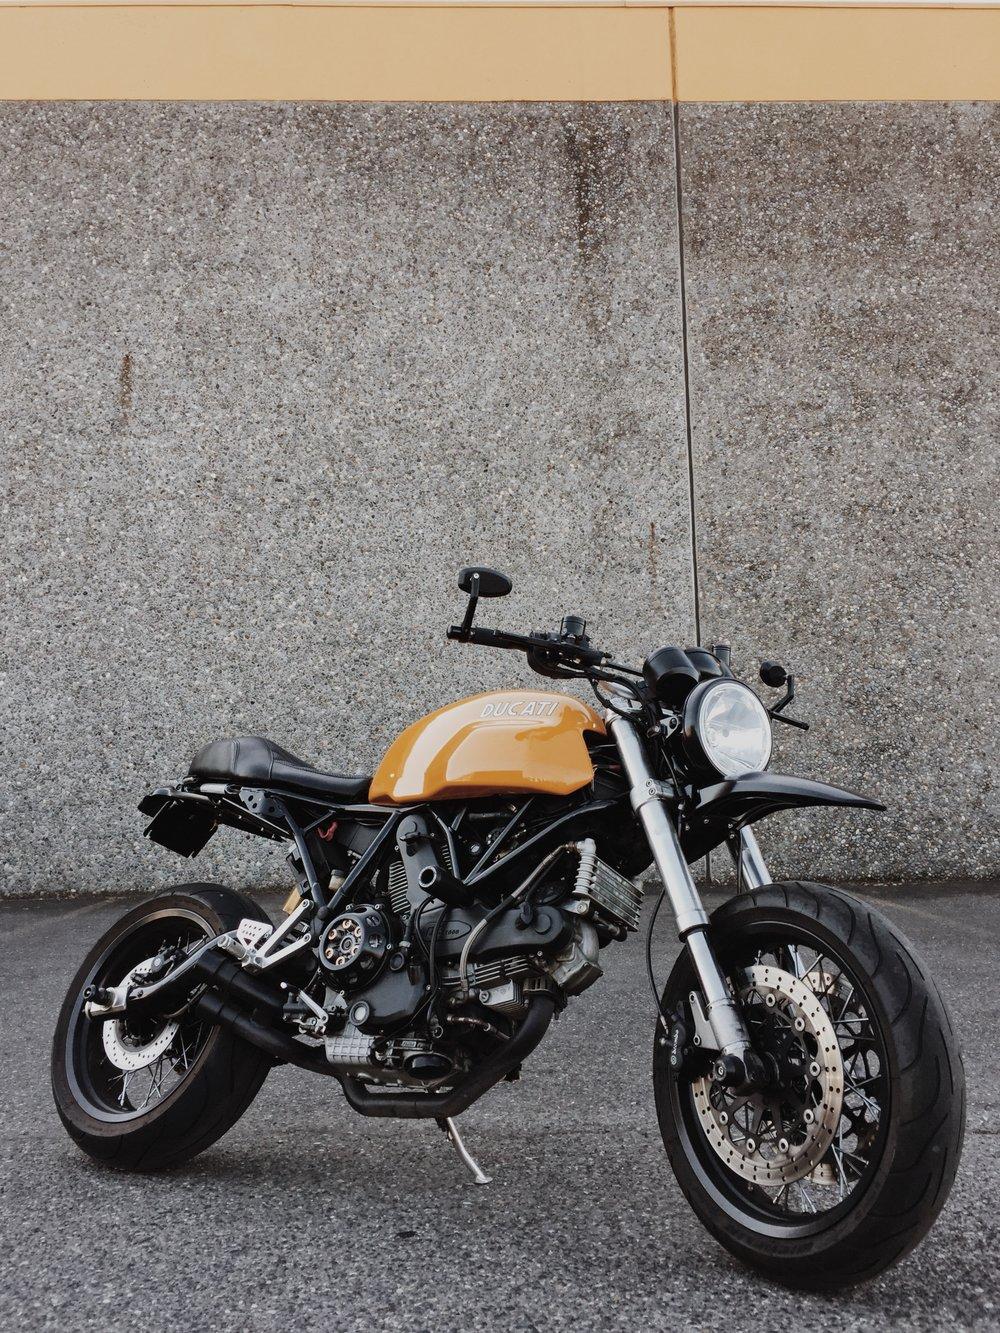 Moto-Mucci_Custom_Ducati_SC1000_Seat (11).jpg